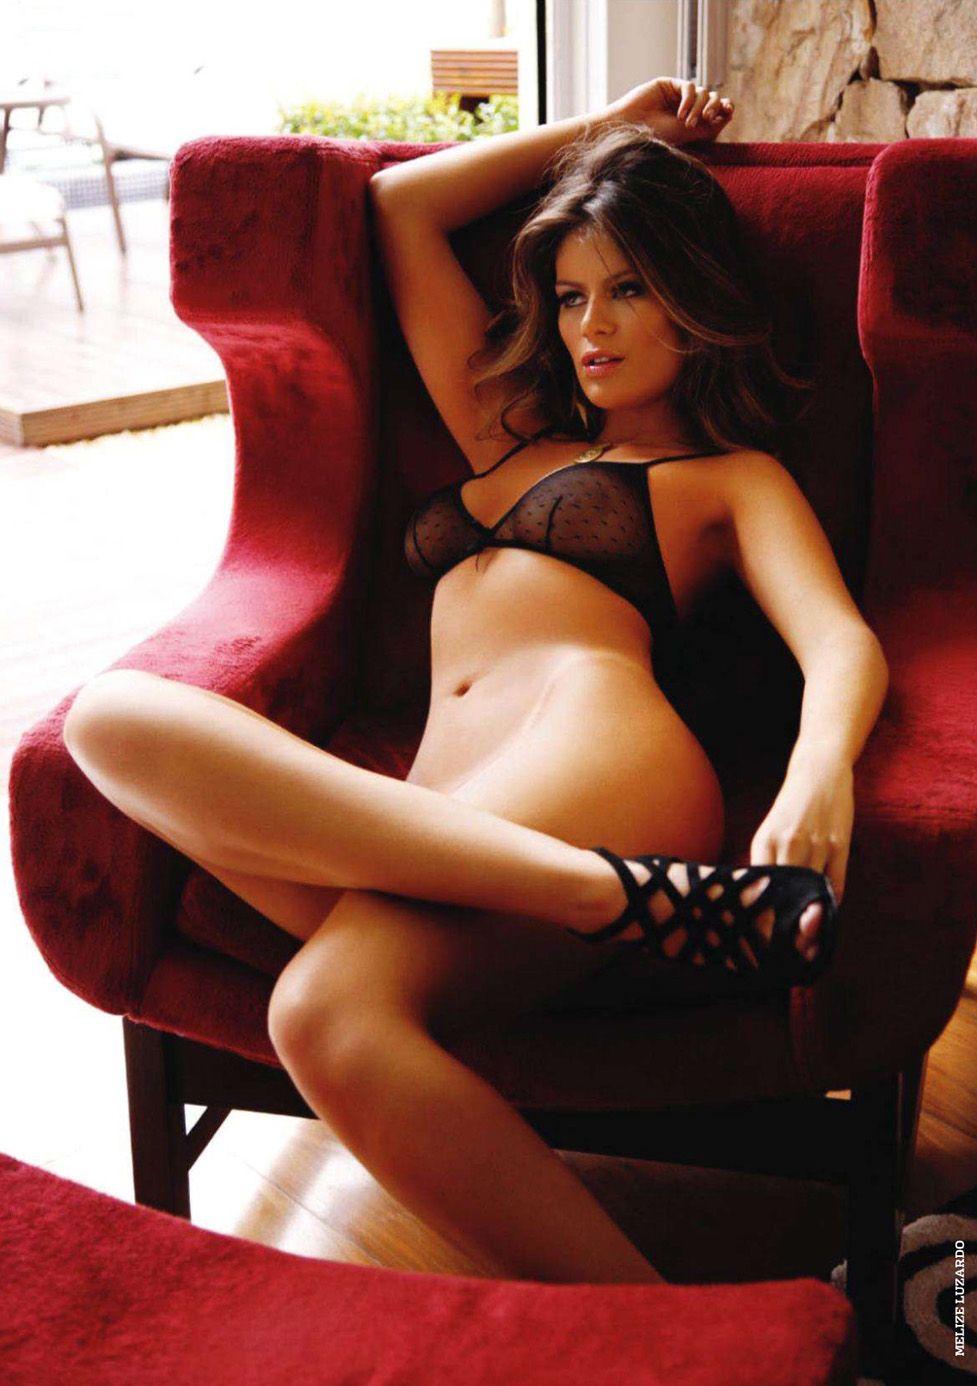 бразильские девушки / Especial Brasilenas in Playboy Spain january 2011 - Melize Luzardo